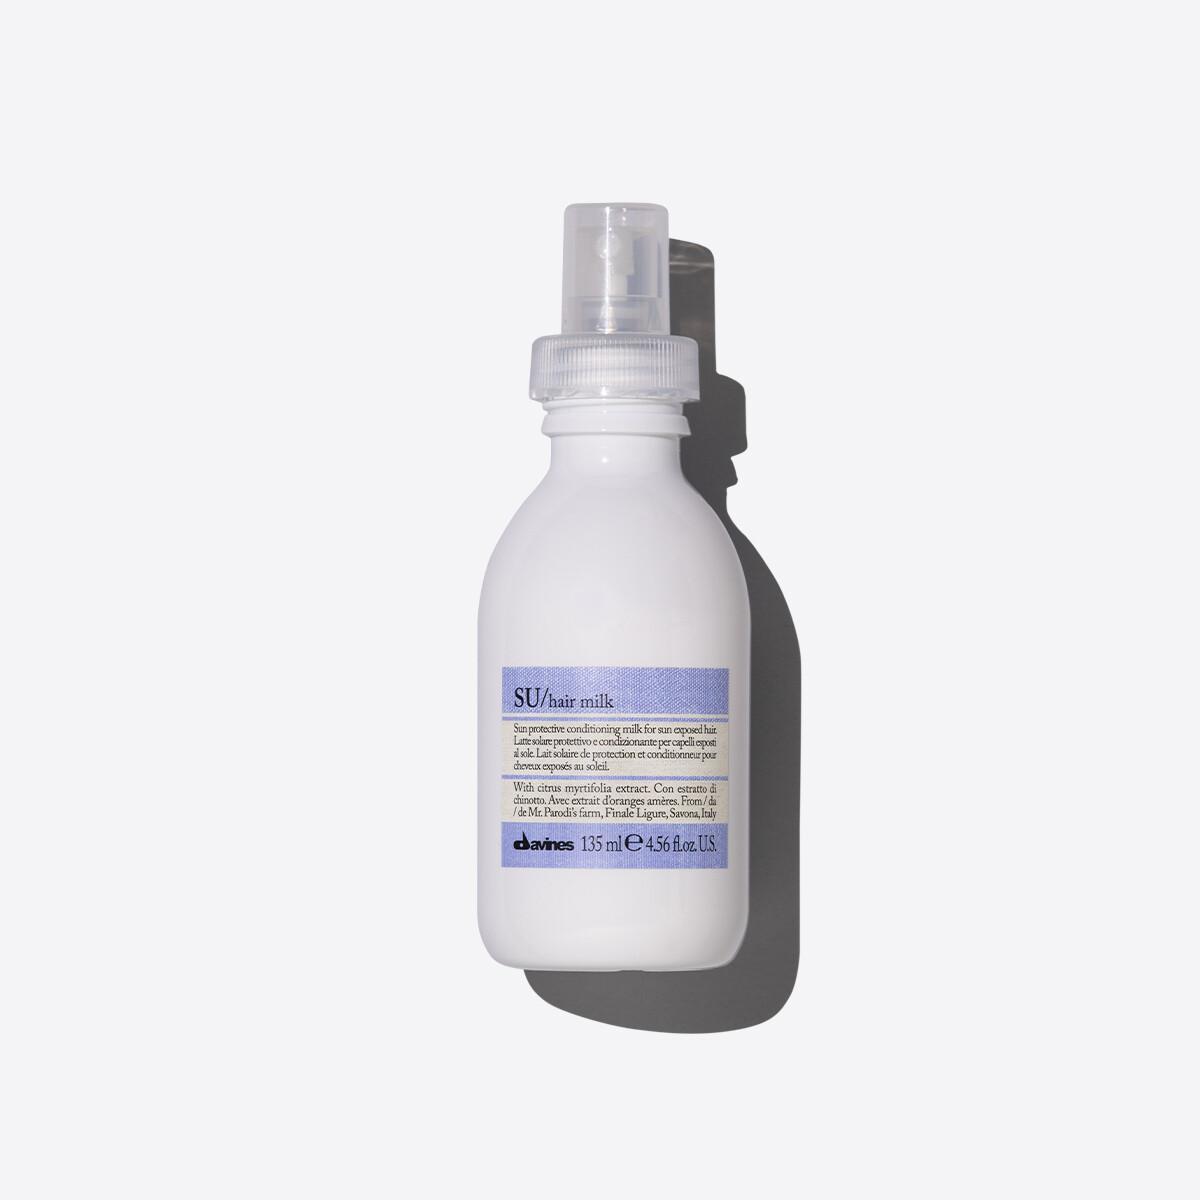 Davines SU Hair Milk 135 ml